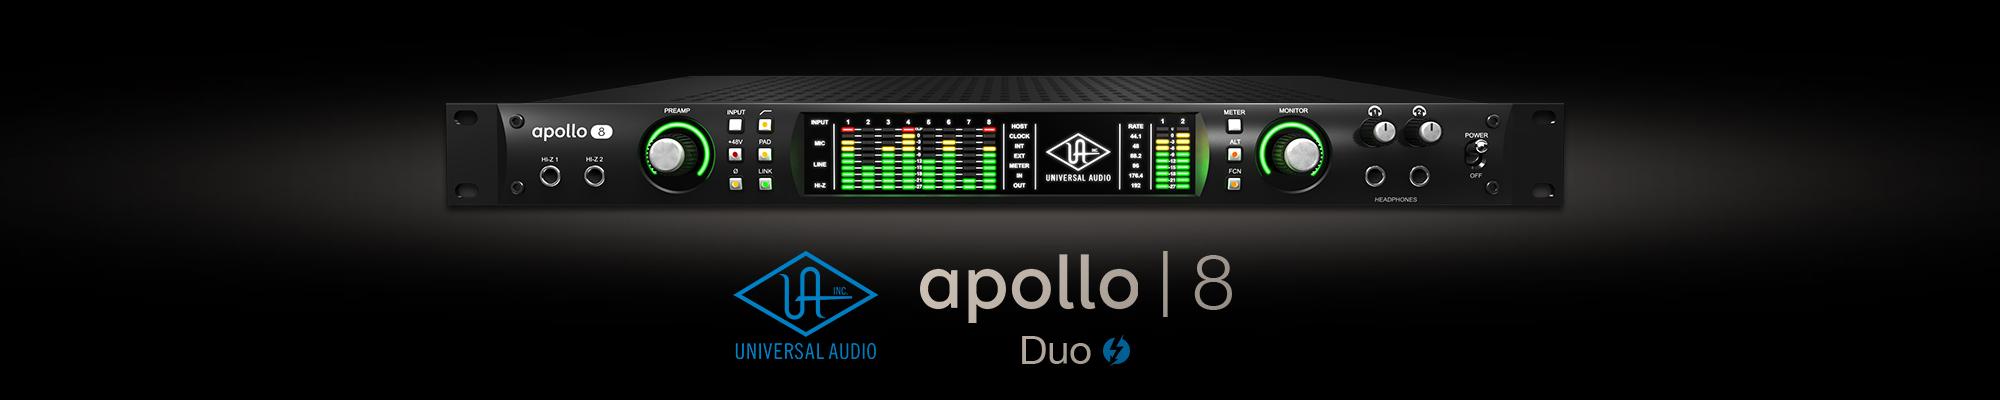 universal audio apollo 8 duo thunderbolt audio interface. Black Bedroom Furniture Sets. Home Design Ideas